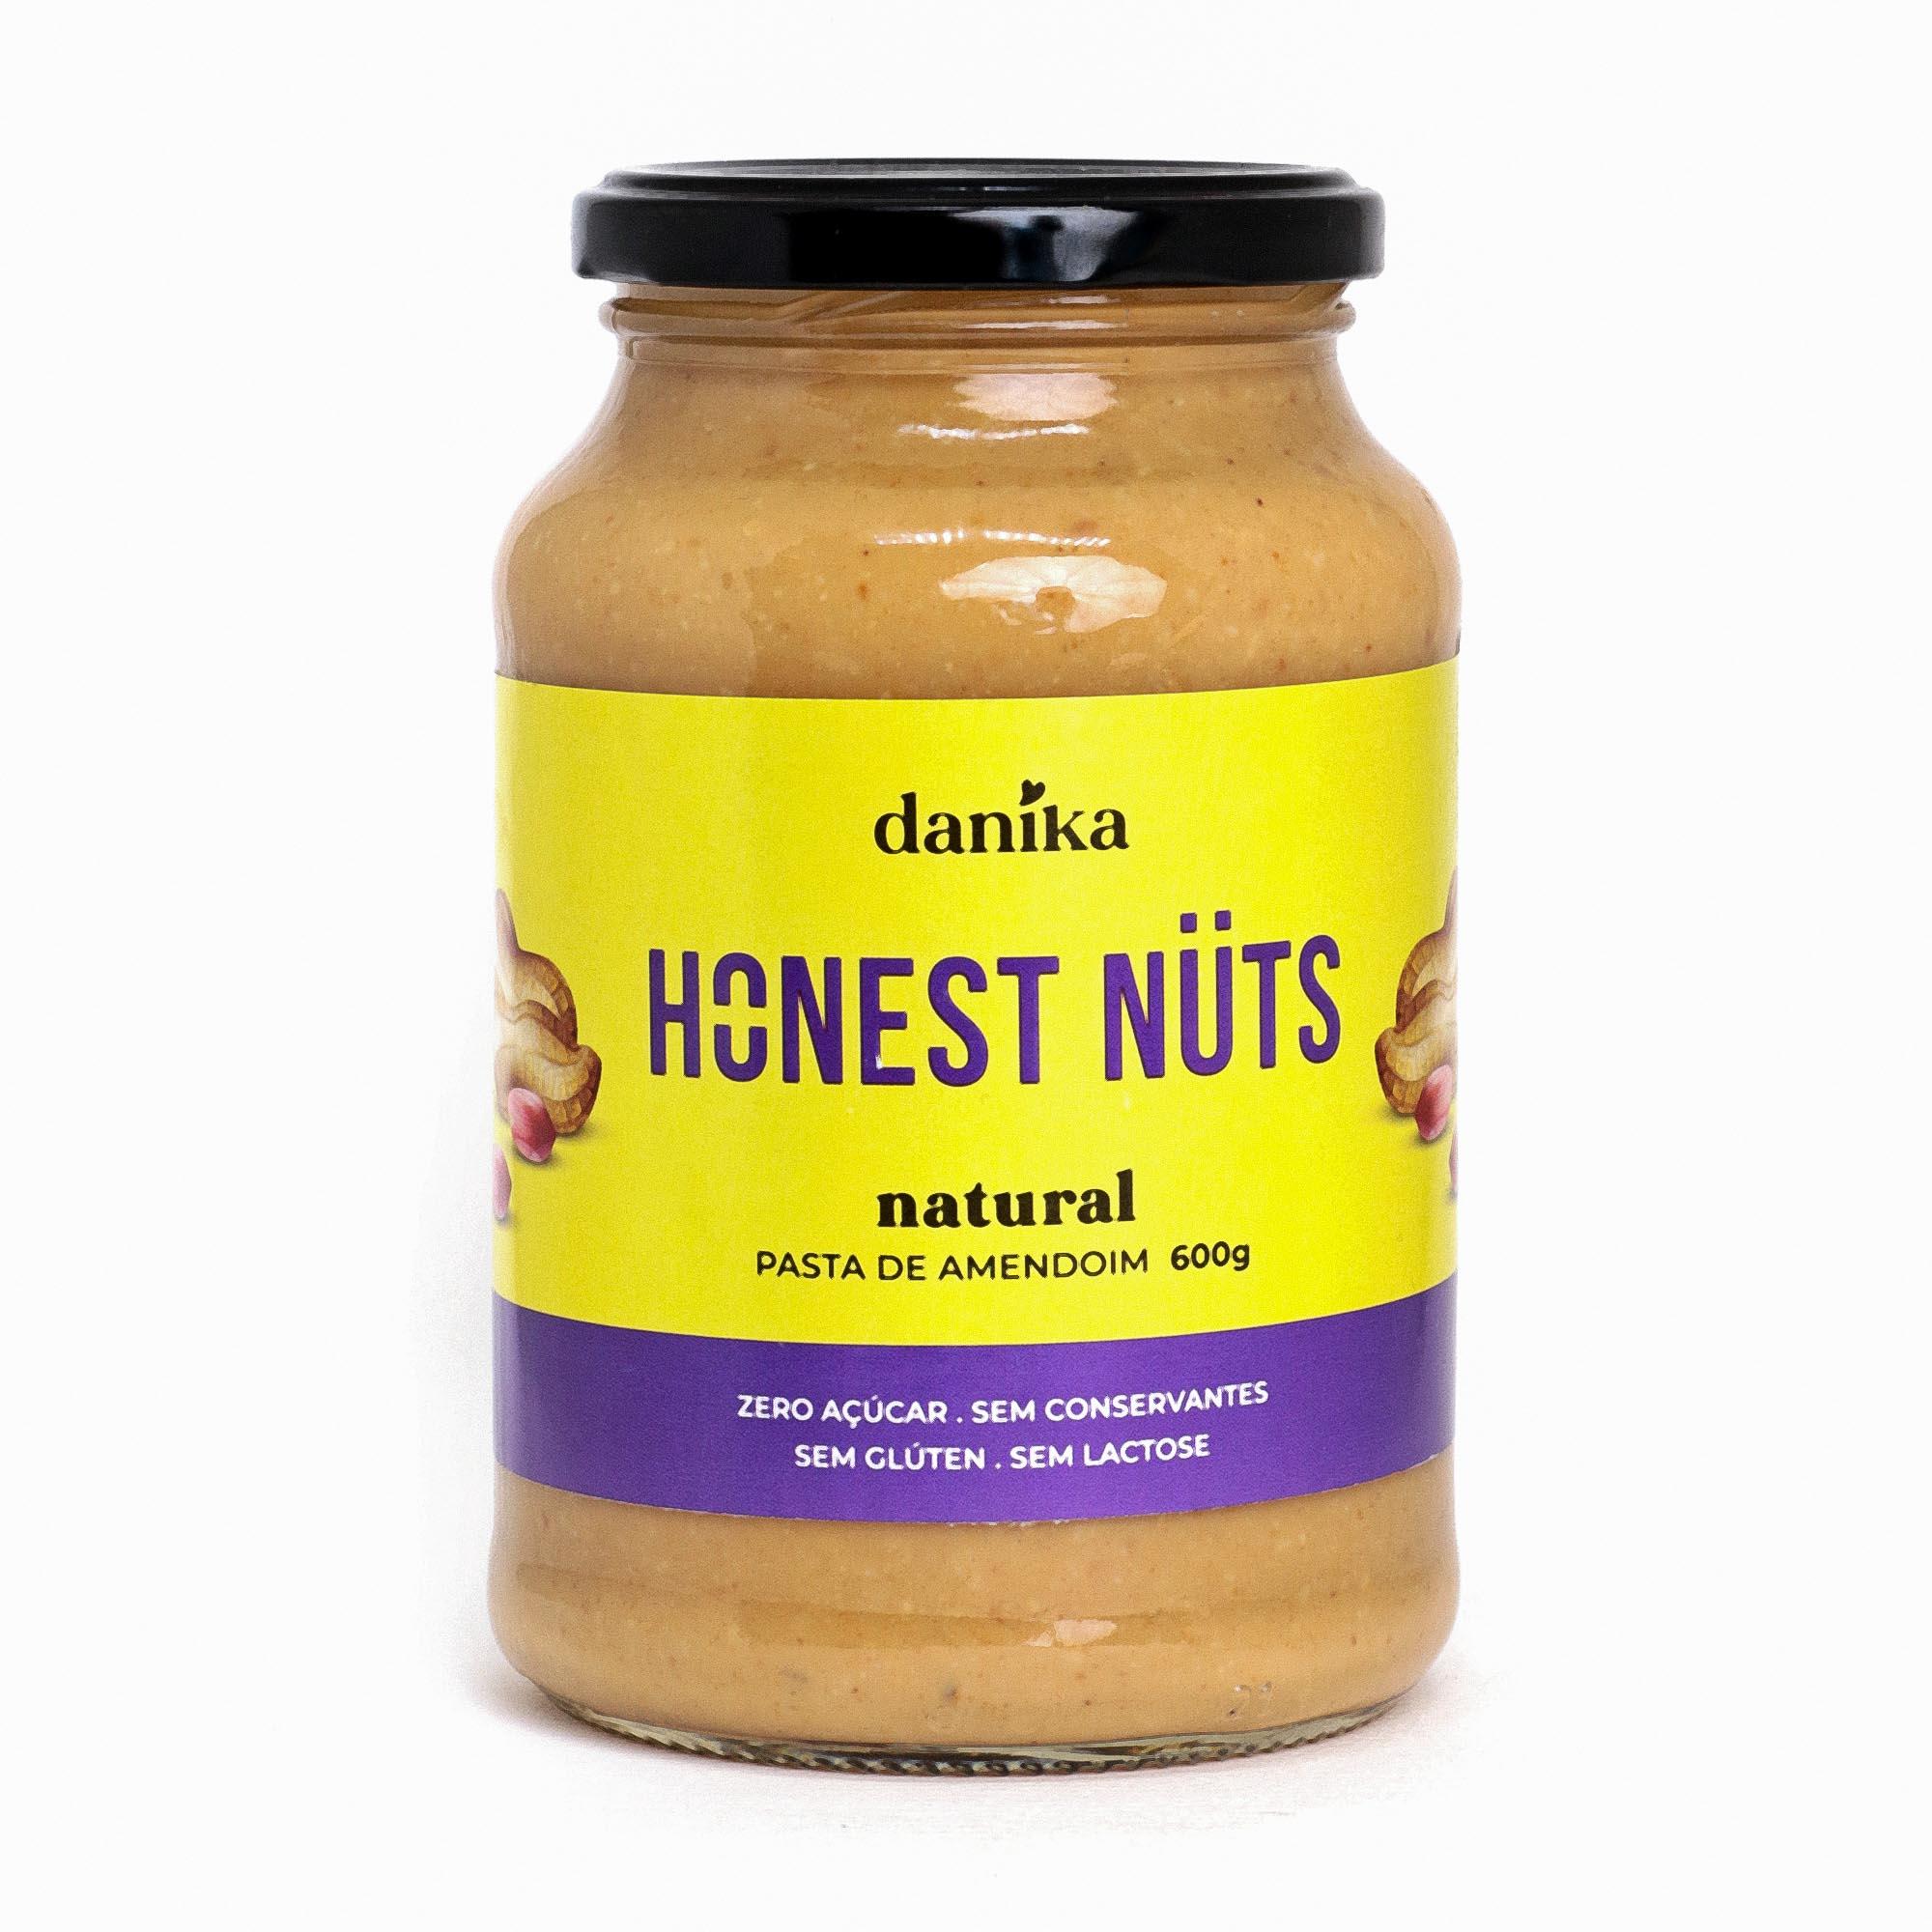 Natural (600g)  - Honest Nuts